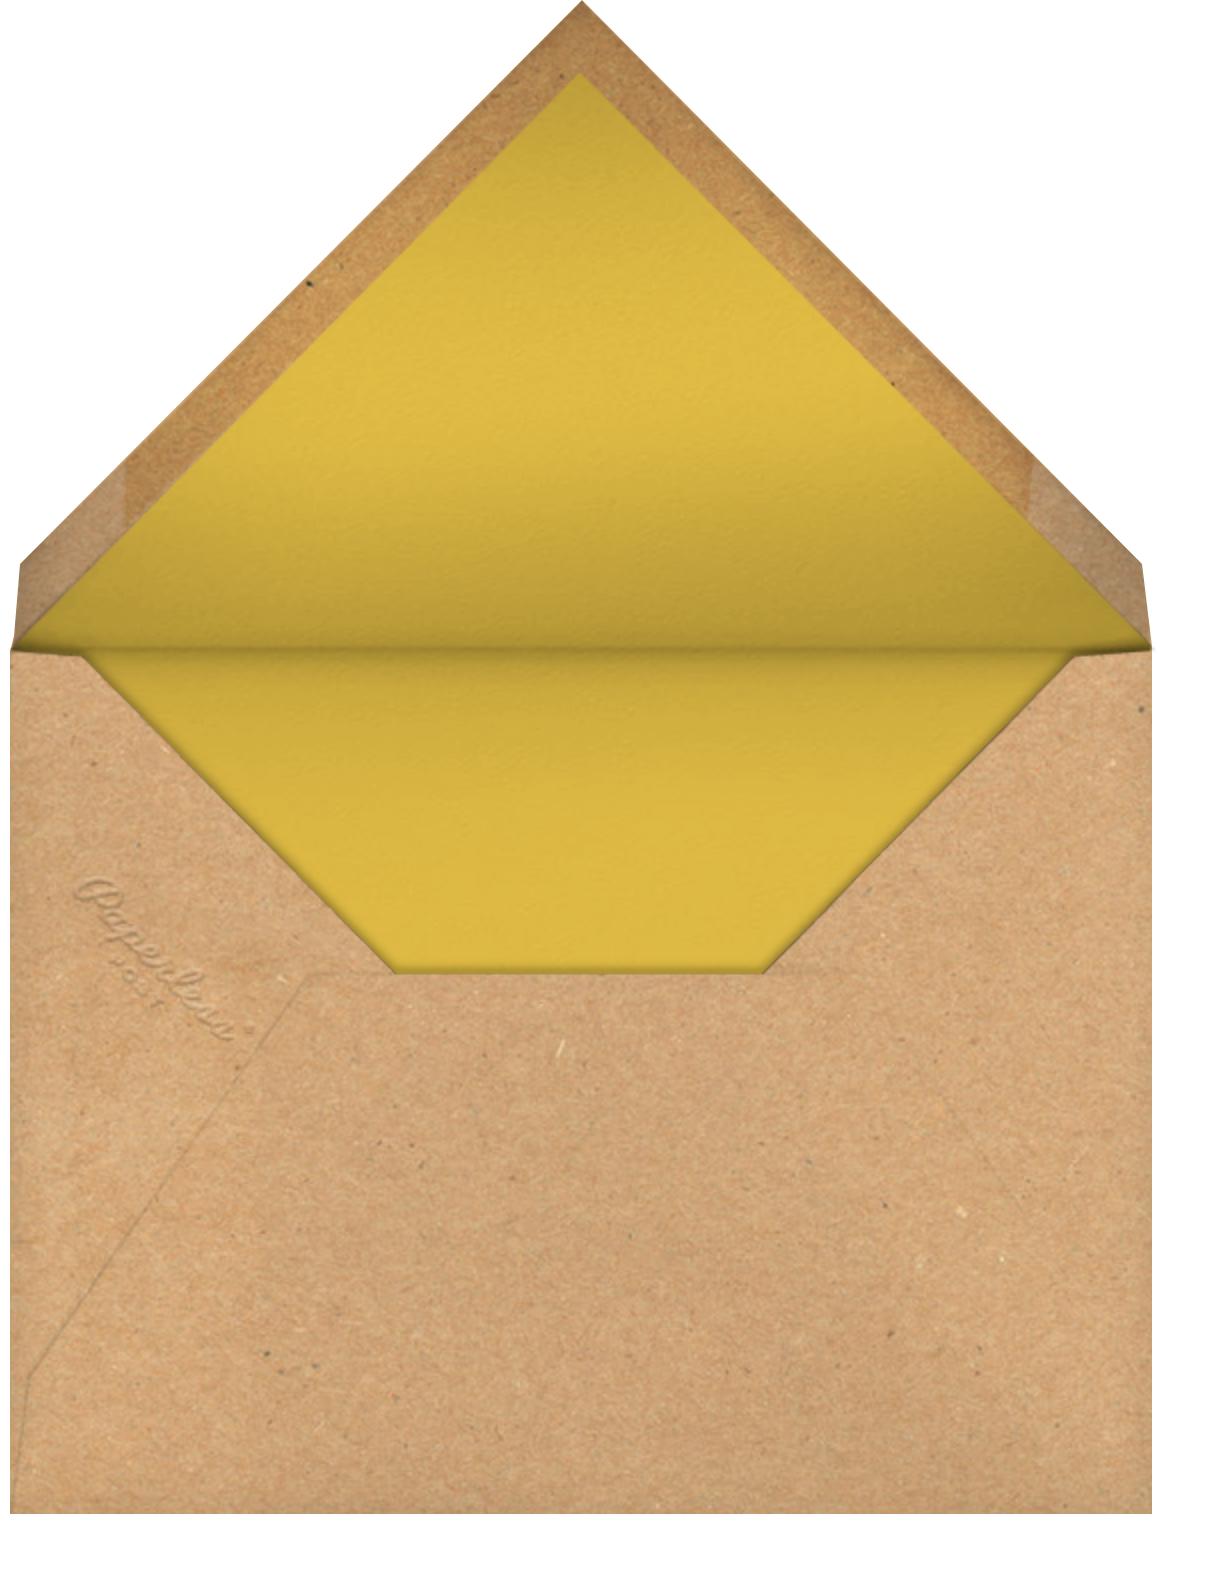 Moor Heather (Square) - Anthropologie - Free birthday eCards - envelope back